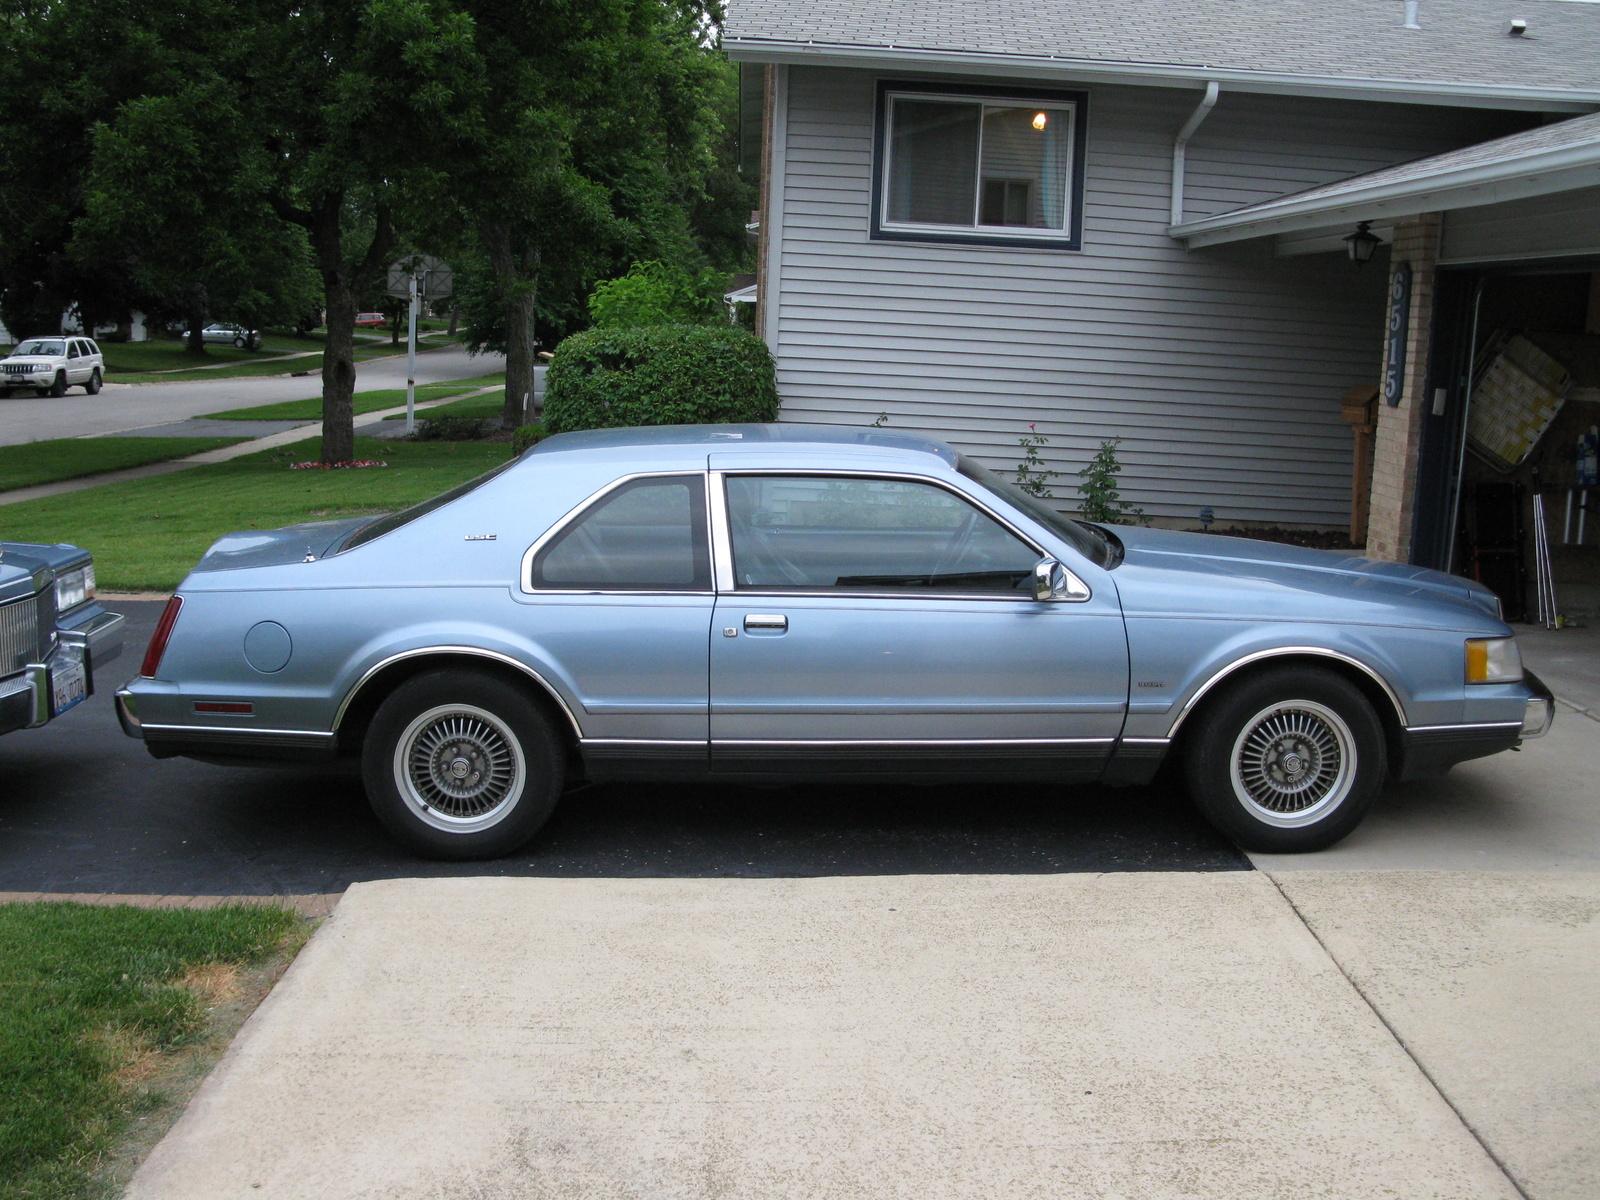 Used Lincoln Mark Viii For Sale Cargurus Autos Post